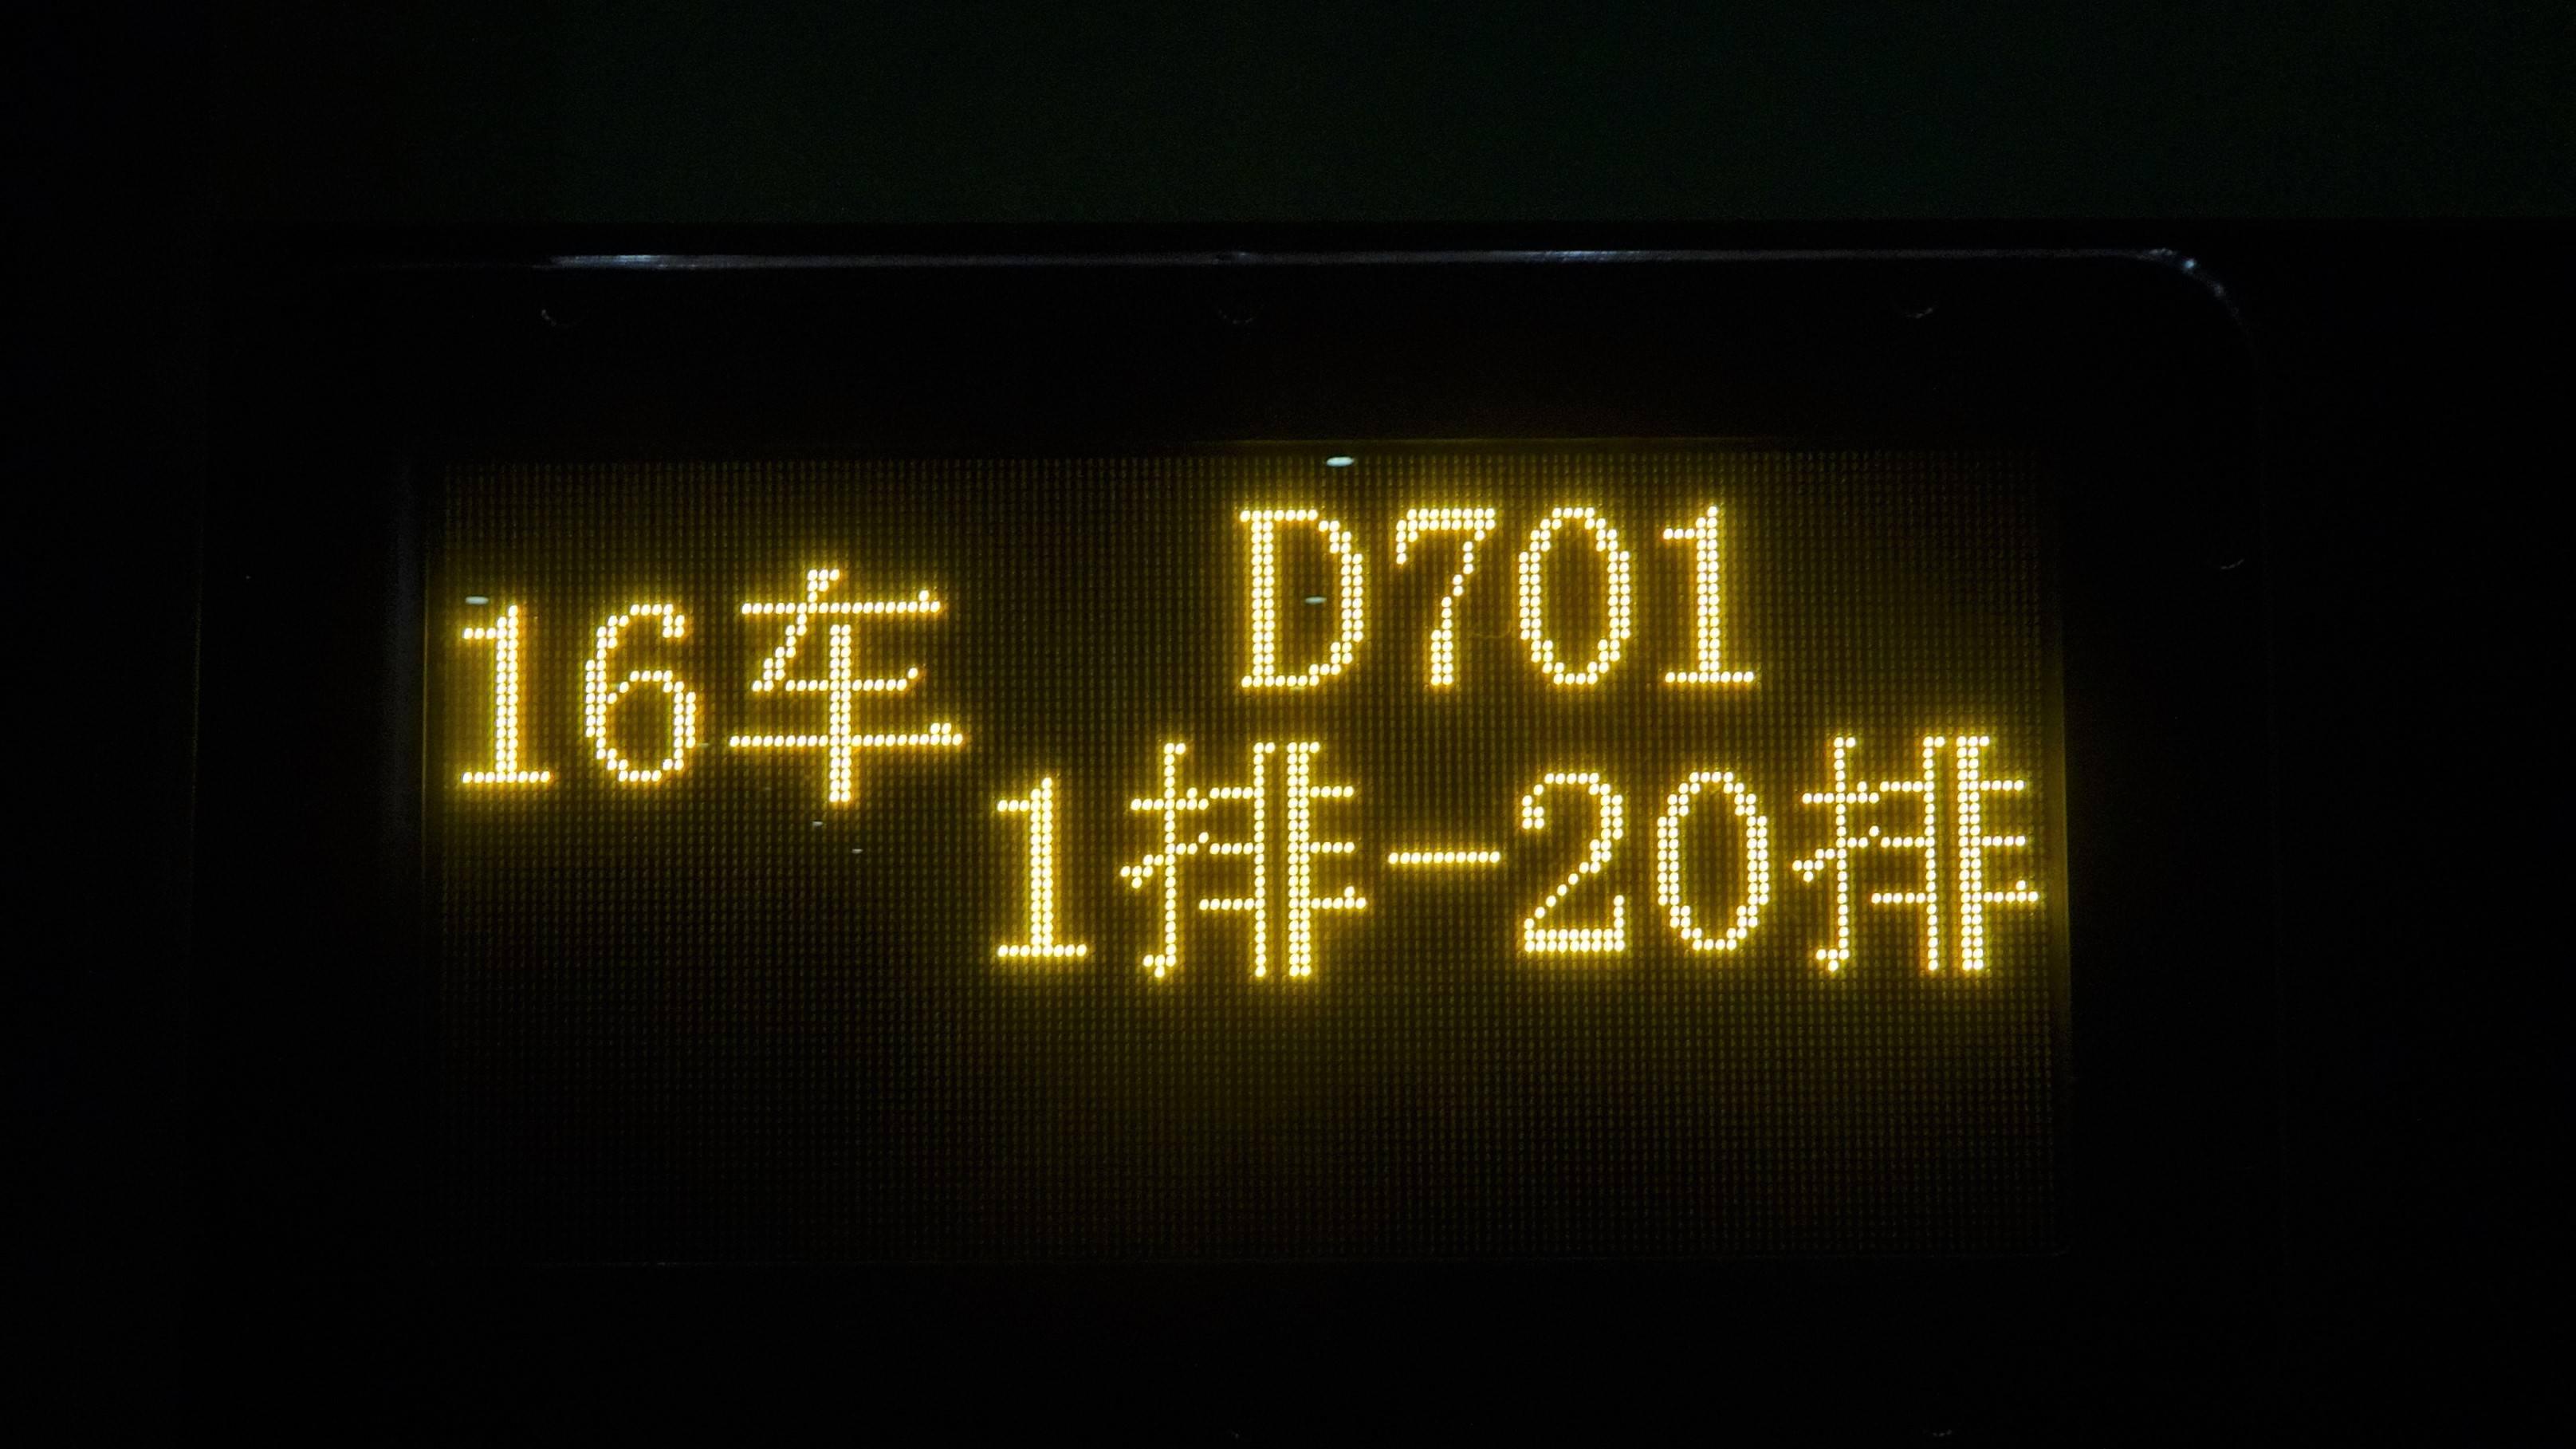 DSC09813.jpg